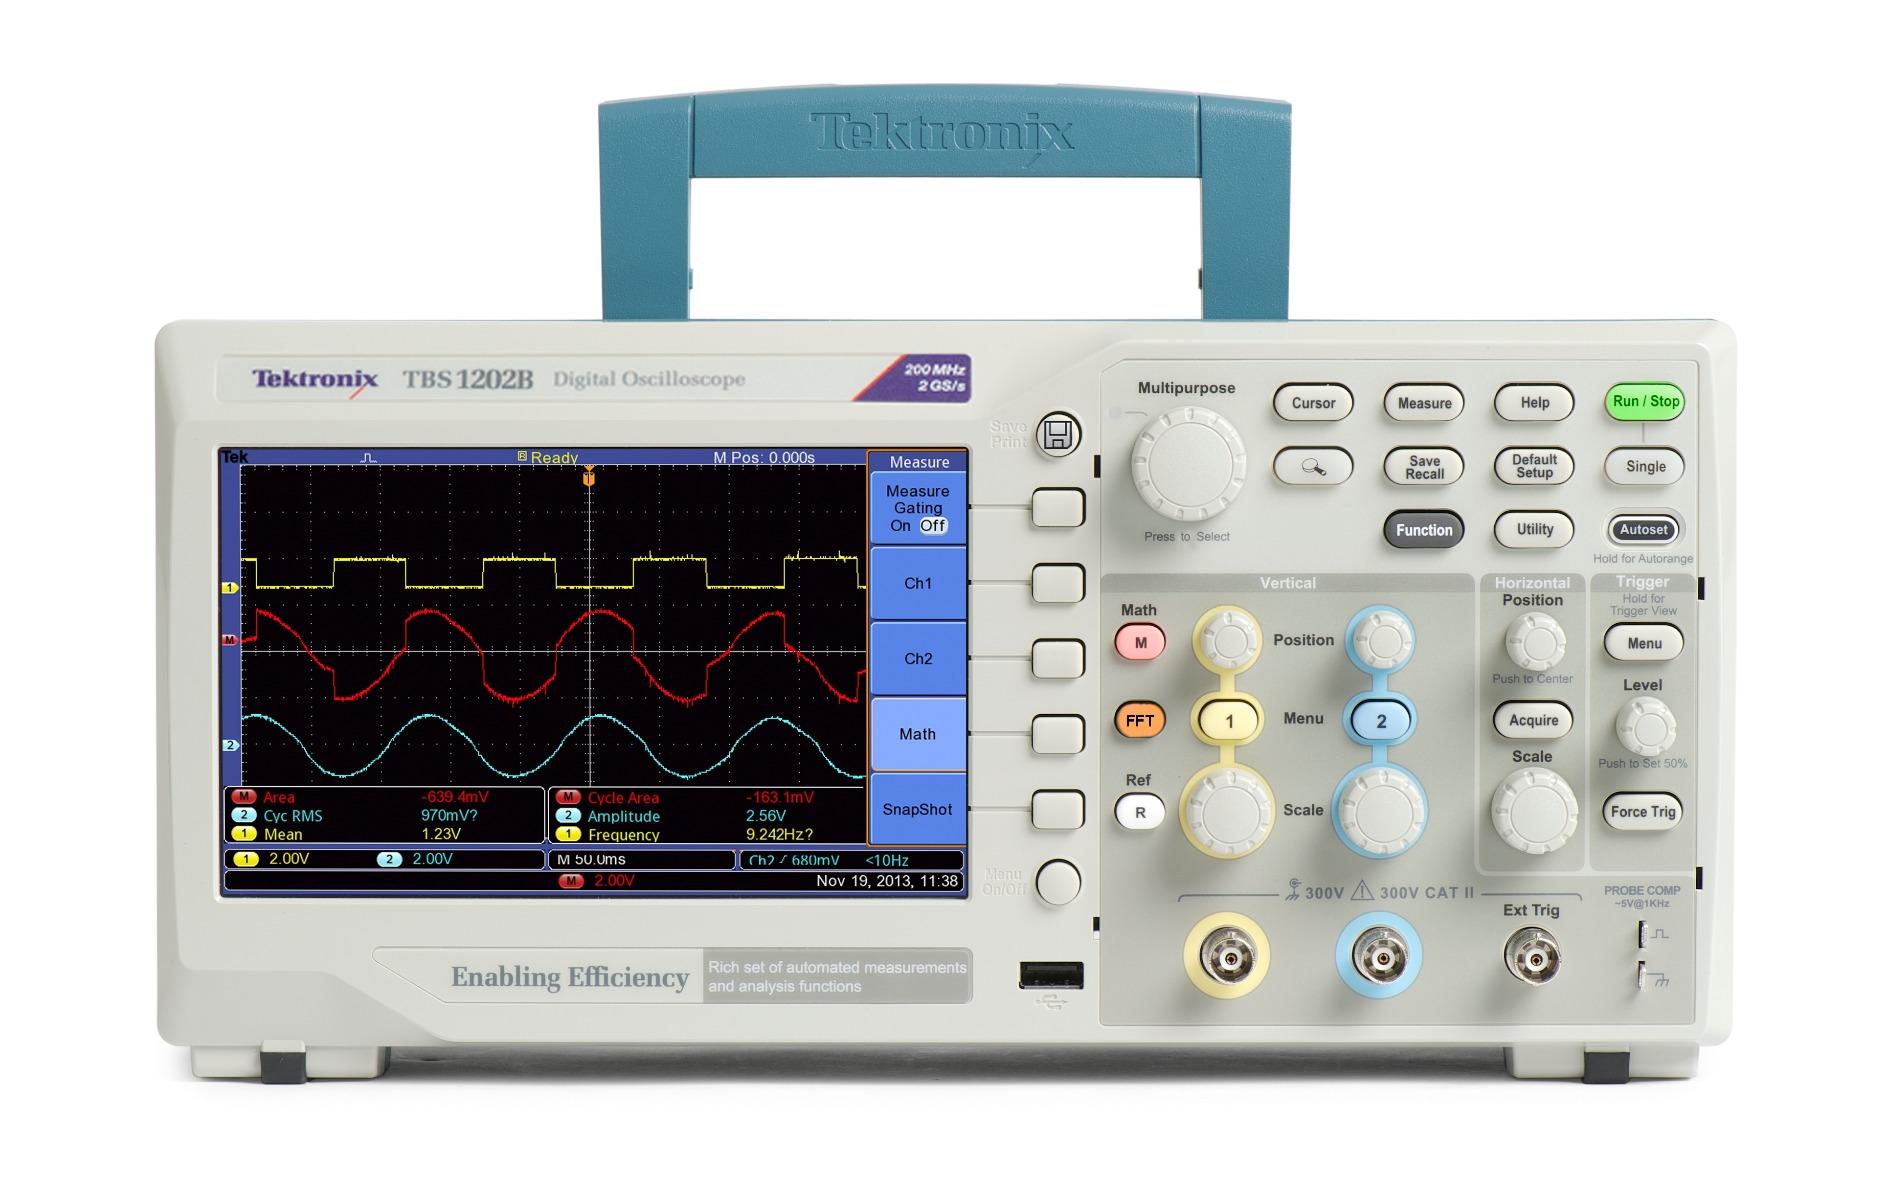 Image of Tektronix-TBS1152B by Valuetronics International Inc